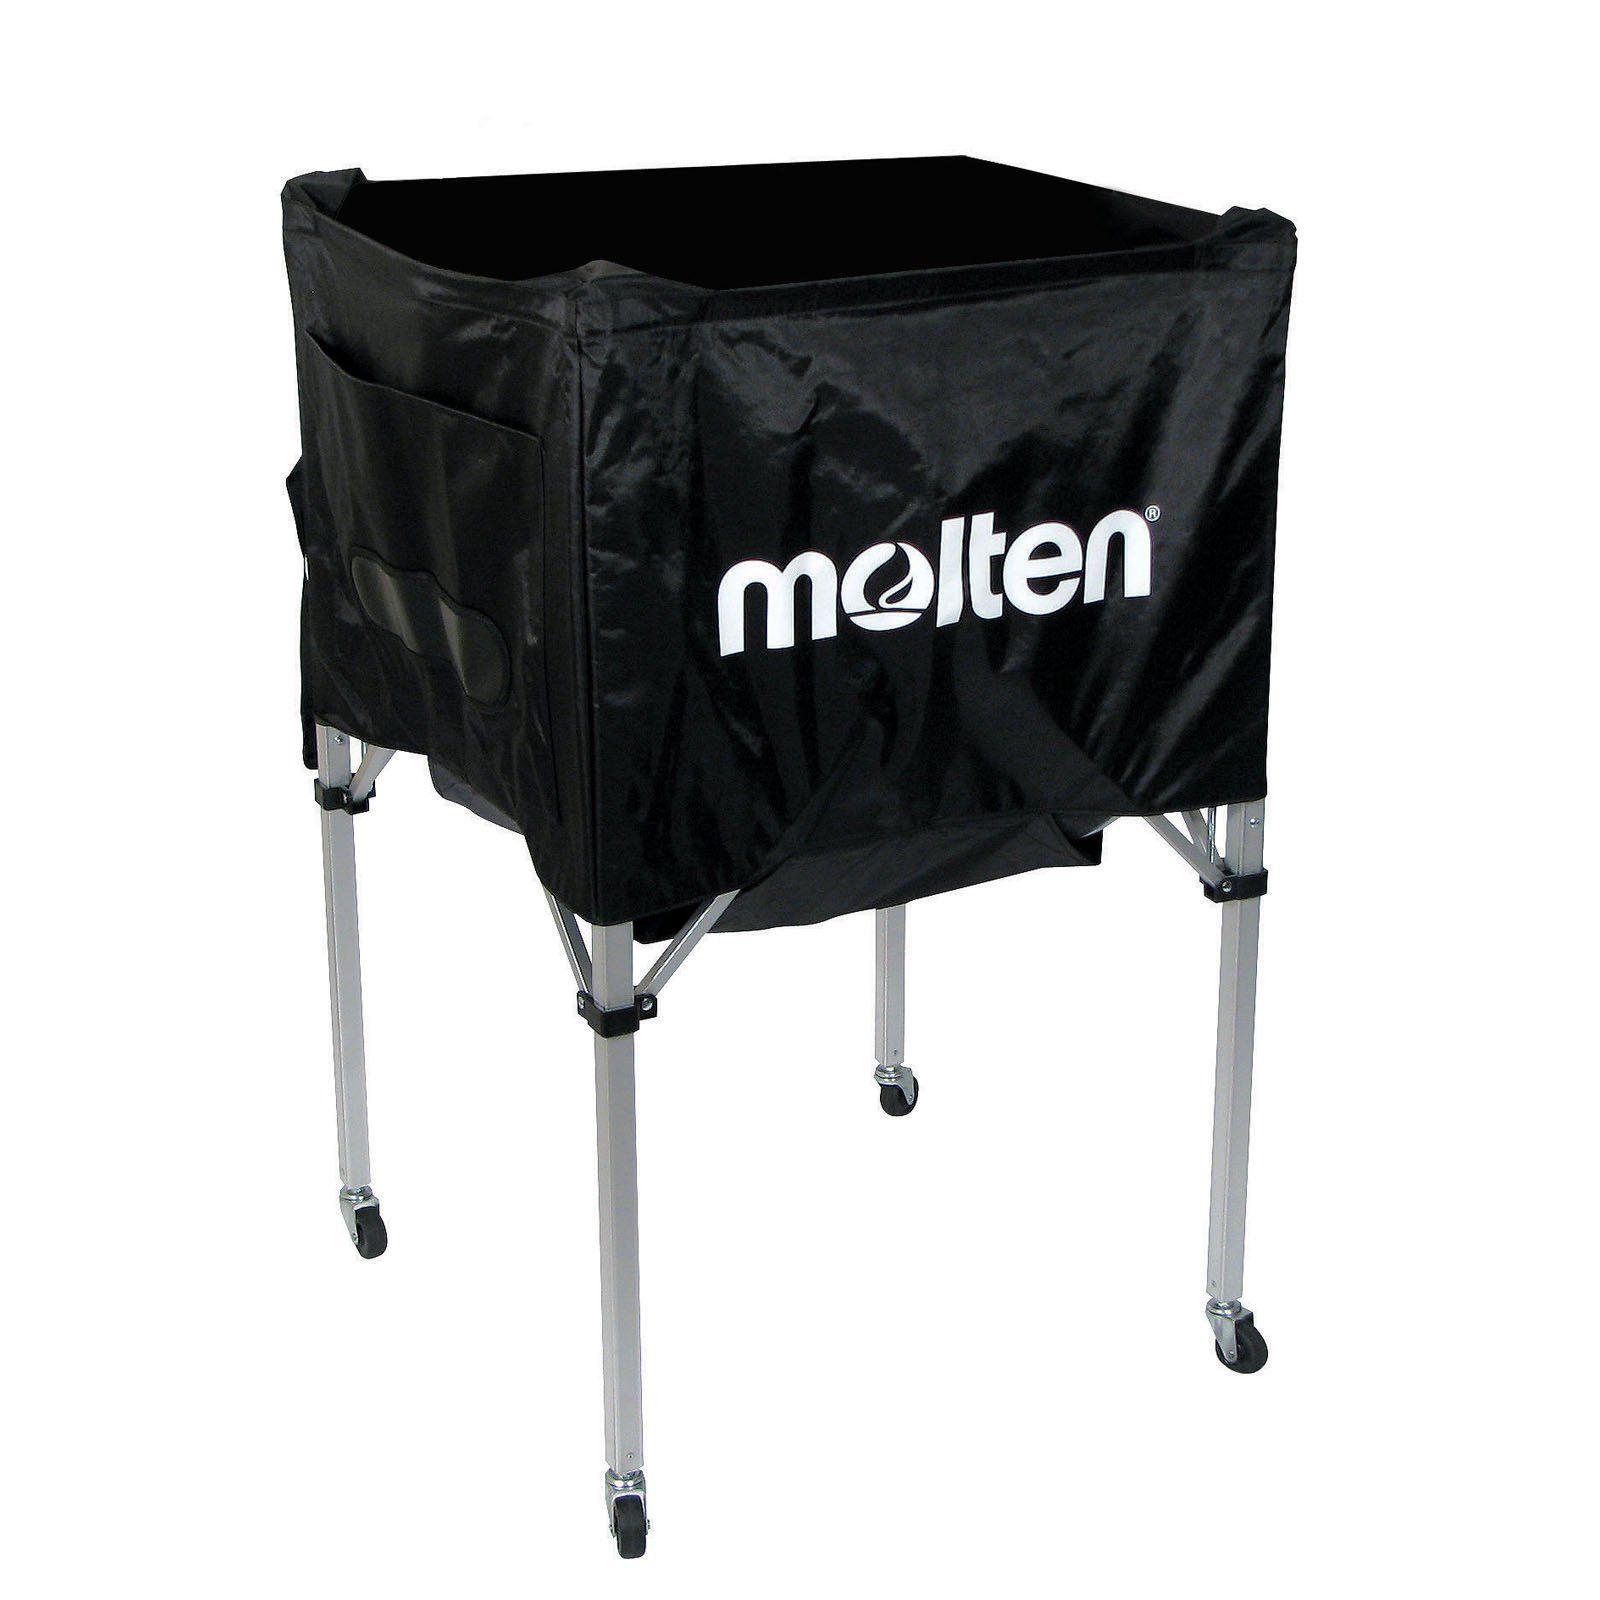 Molten Standard Series Square Ball Cart Black Molten Volleyball Simple Storage